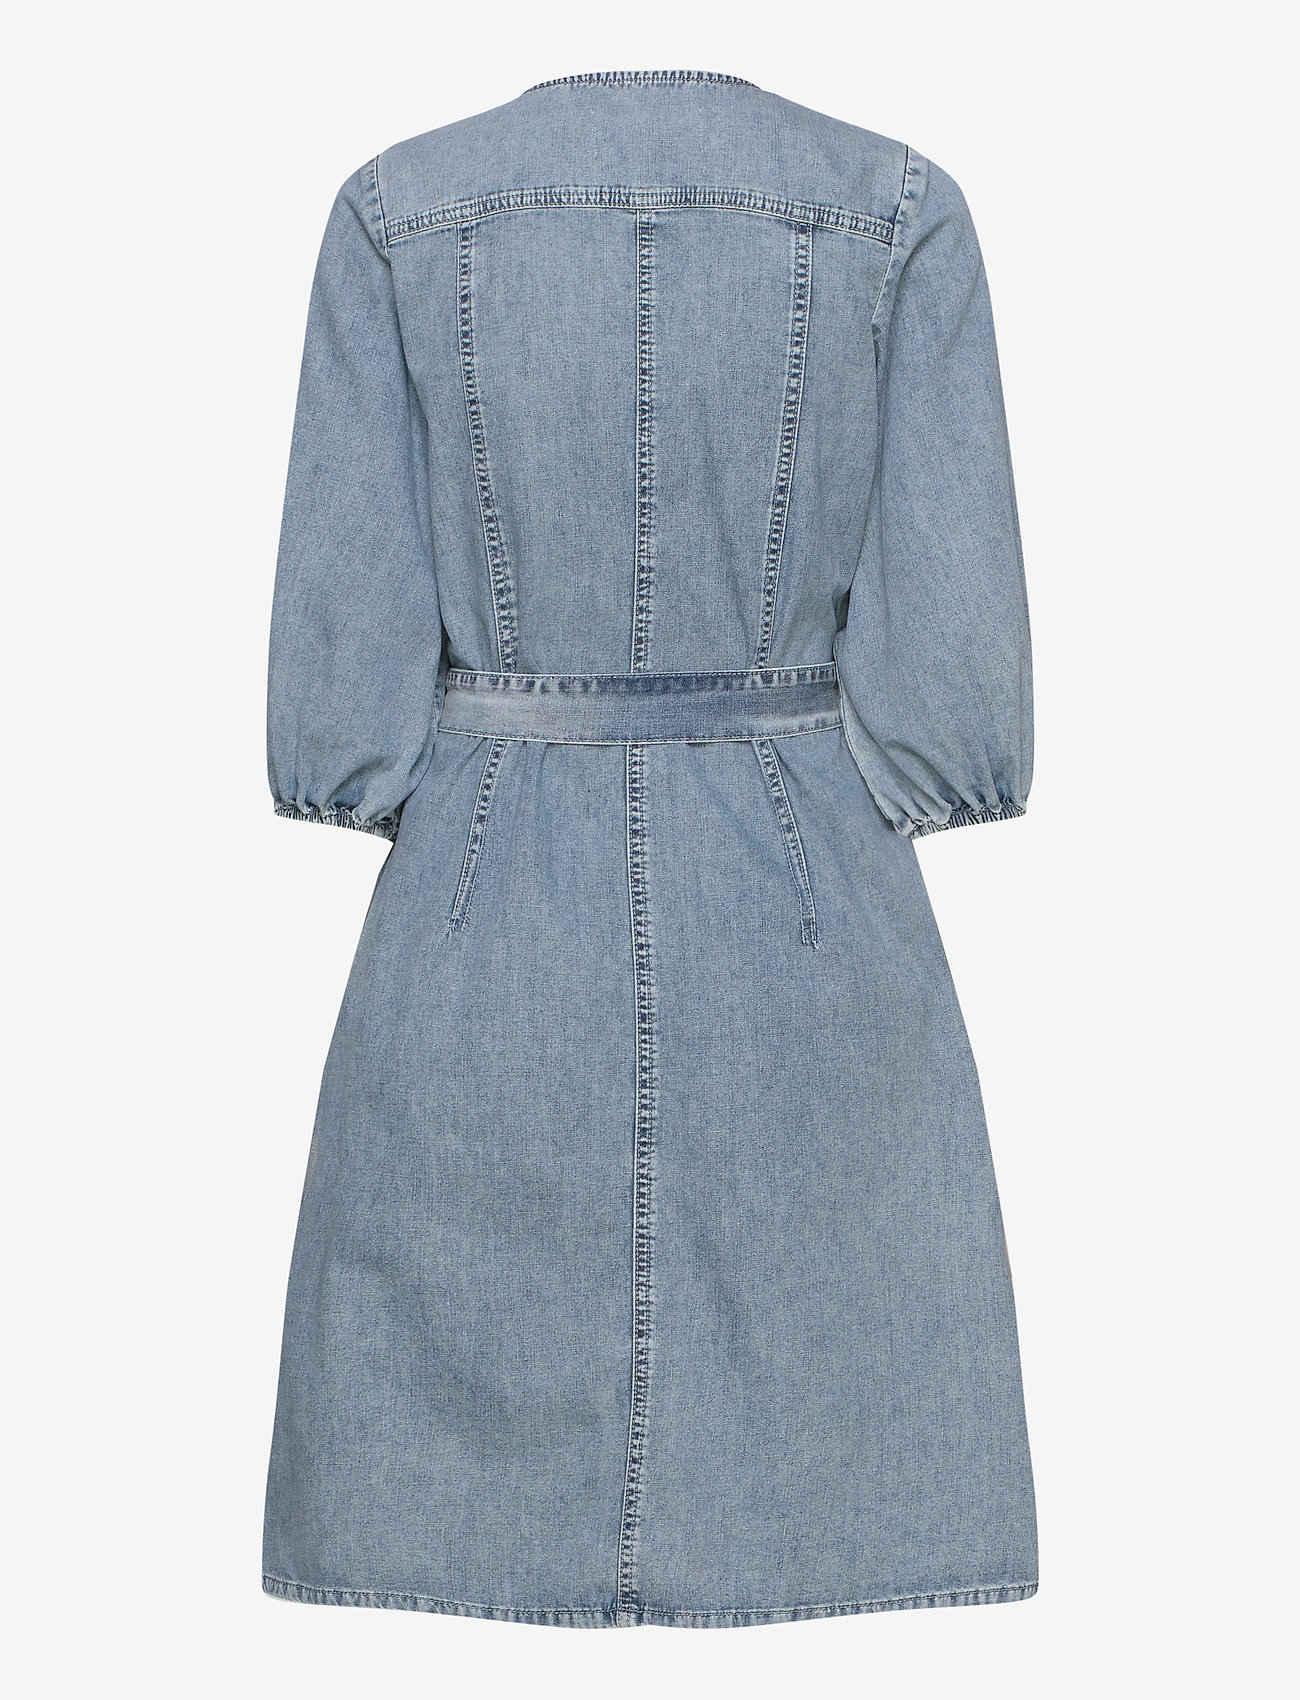 Brookekb Denim Dress (Light Vintage Wash) - Karen By Simonsen C5NJyR